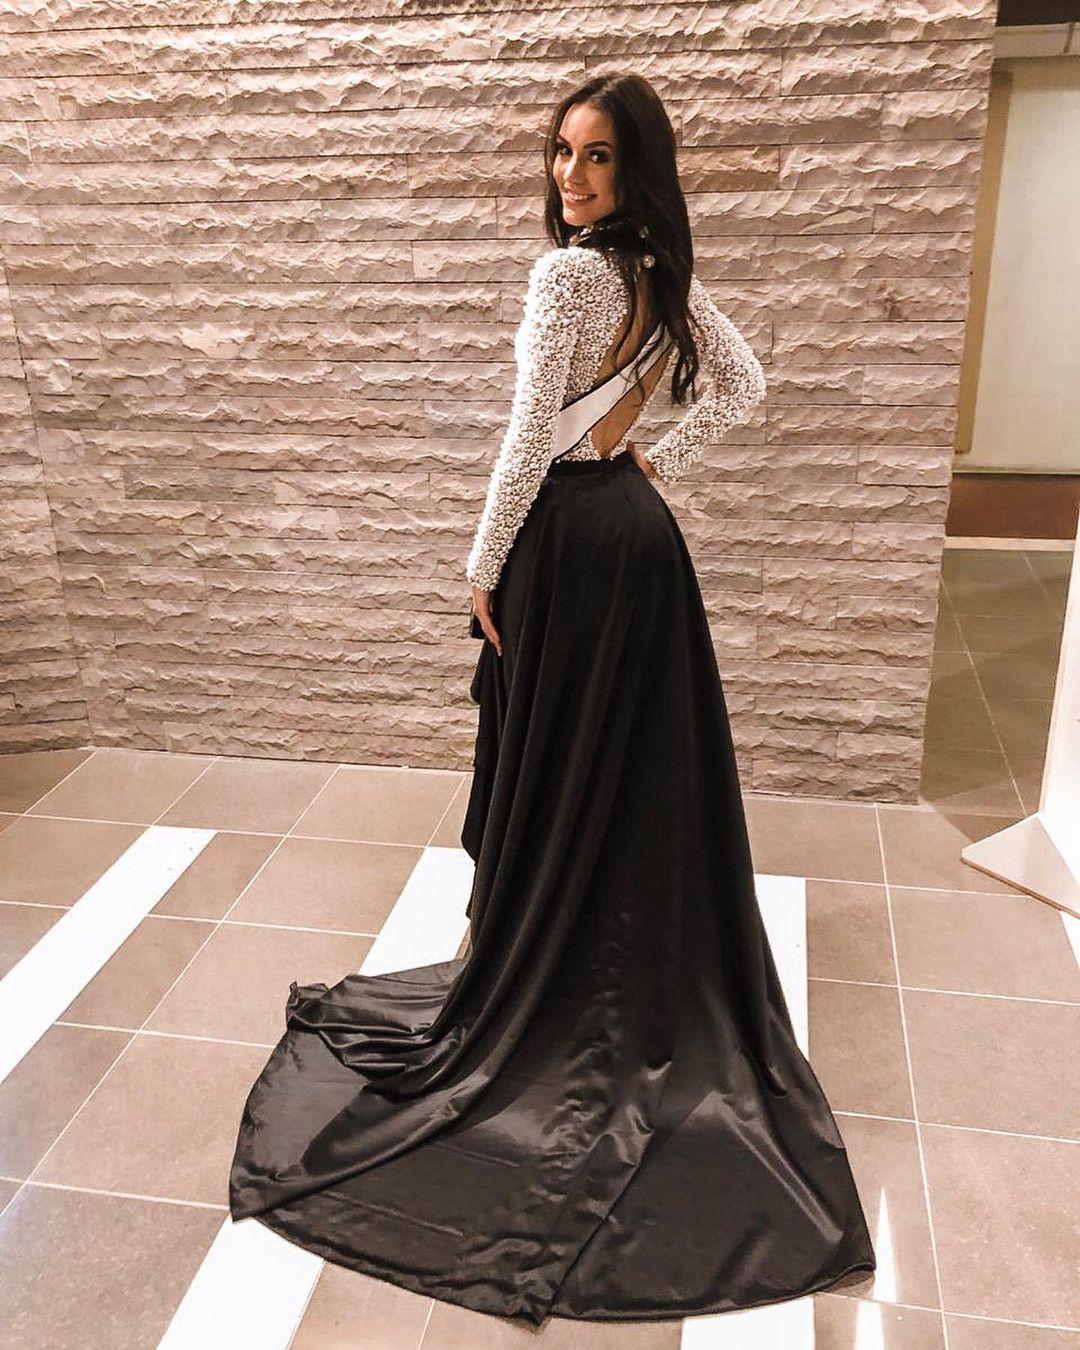 rafaella felipe, top 20 de miss brasil mundo 2019. - Página 10 69415110